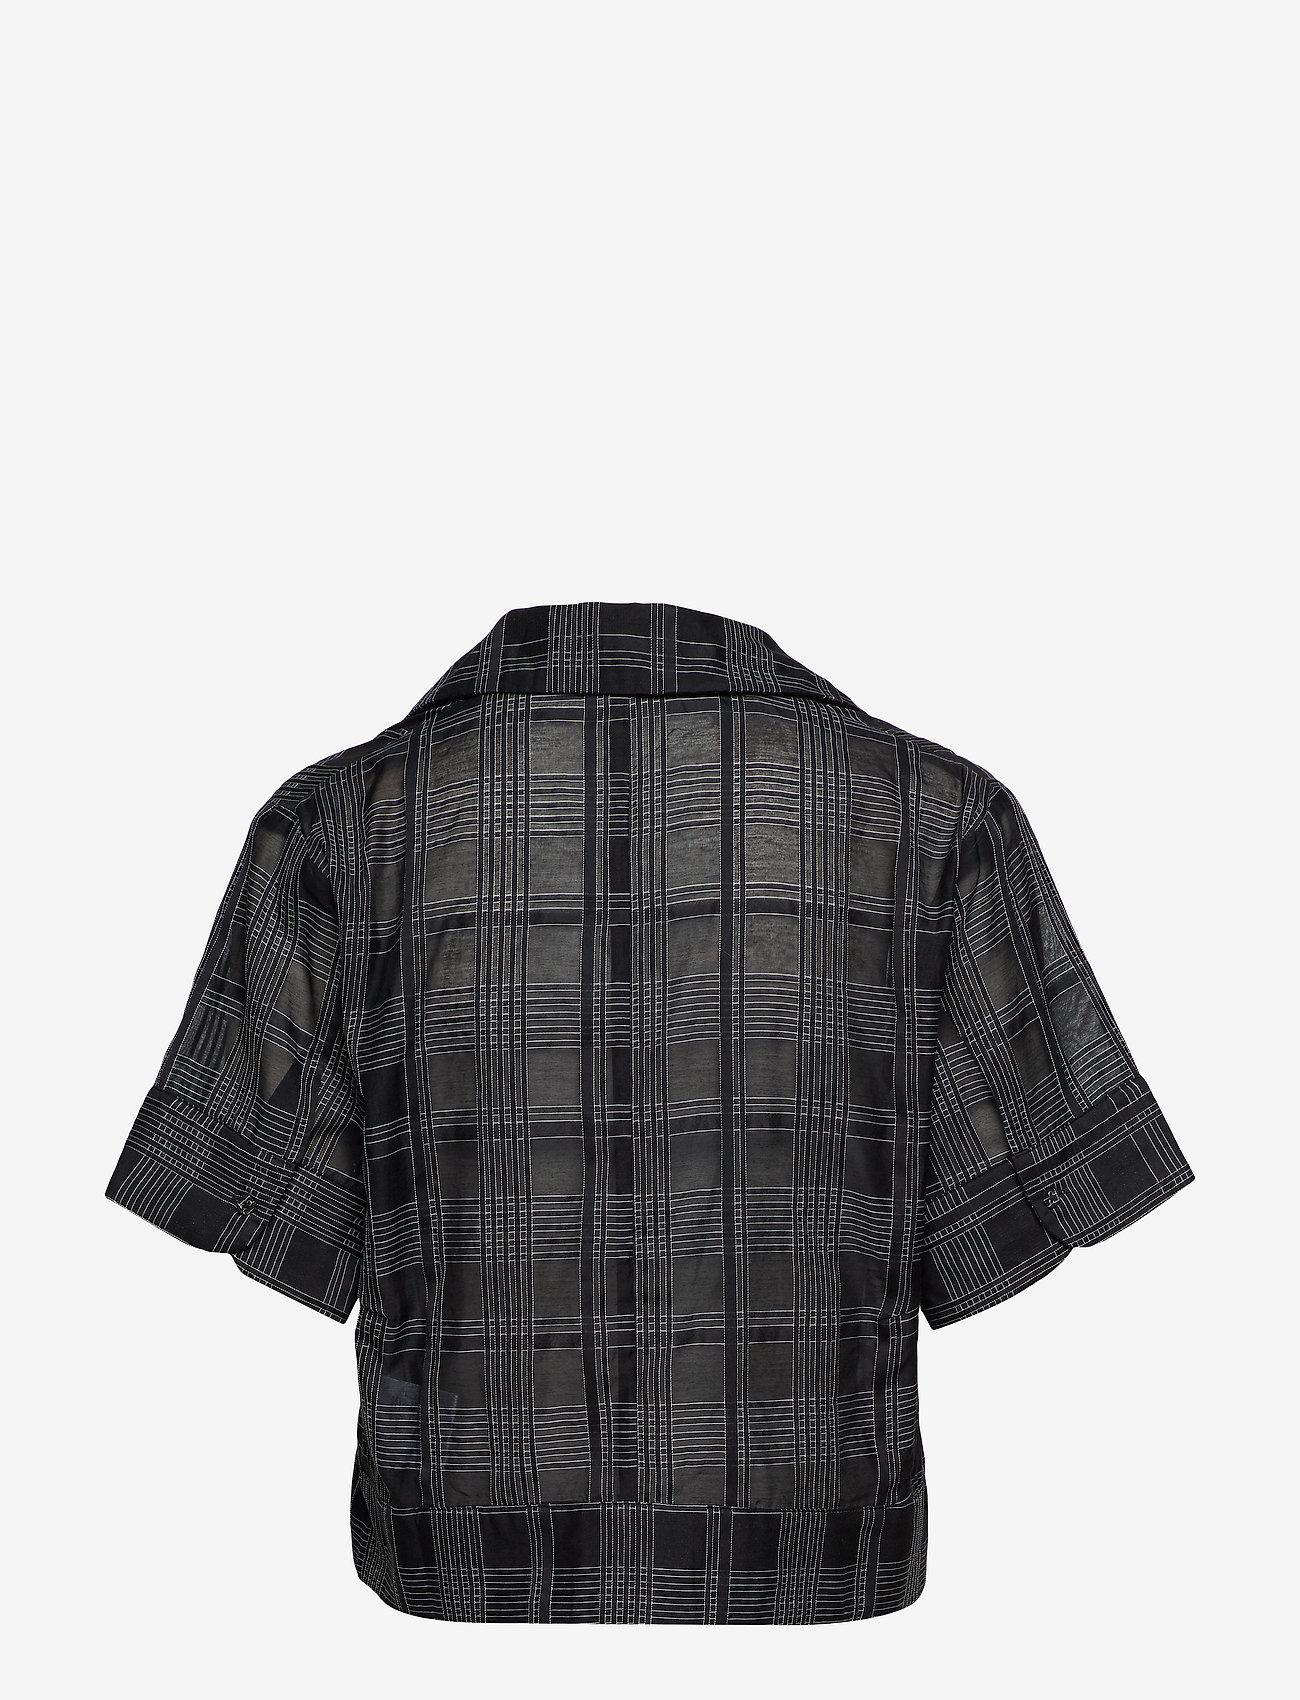 Whyred - MACKENZIE GEOMETRIC - chemises à manches courtes - black / white - 1